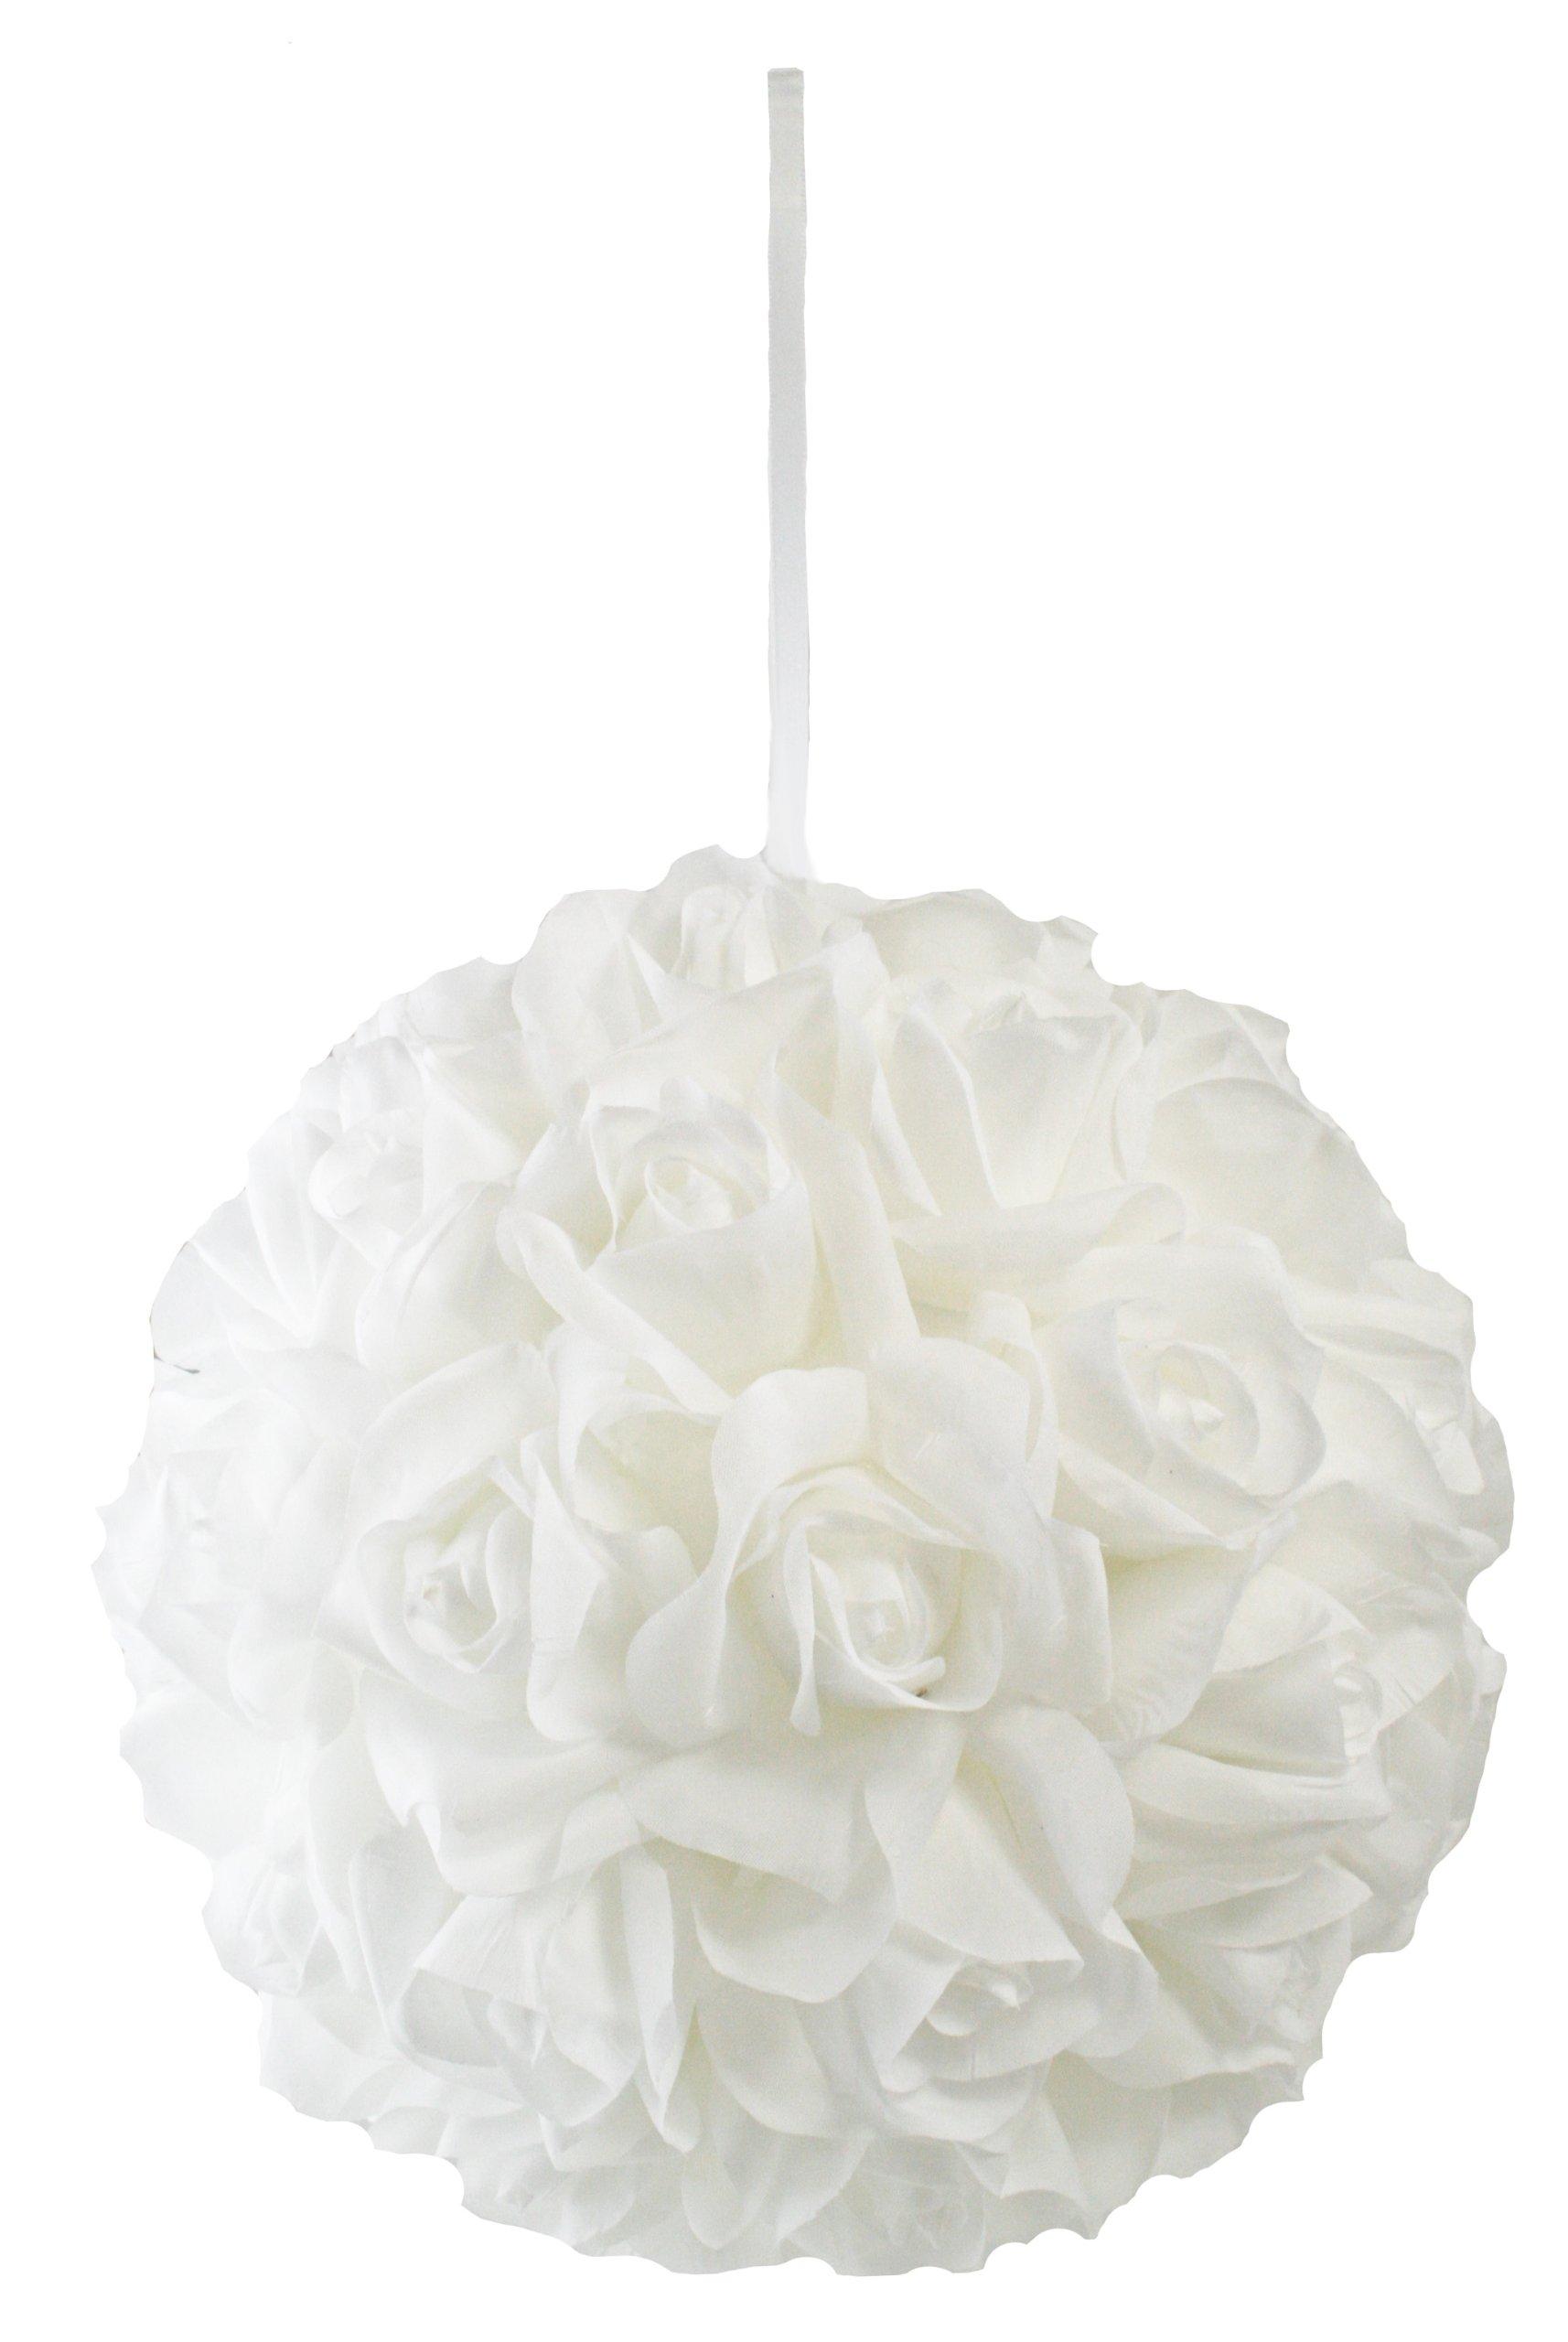 Garden-Rose-Kissing-Ball-White-10-Inch-Pomander-Extra-Large